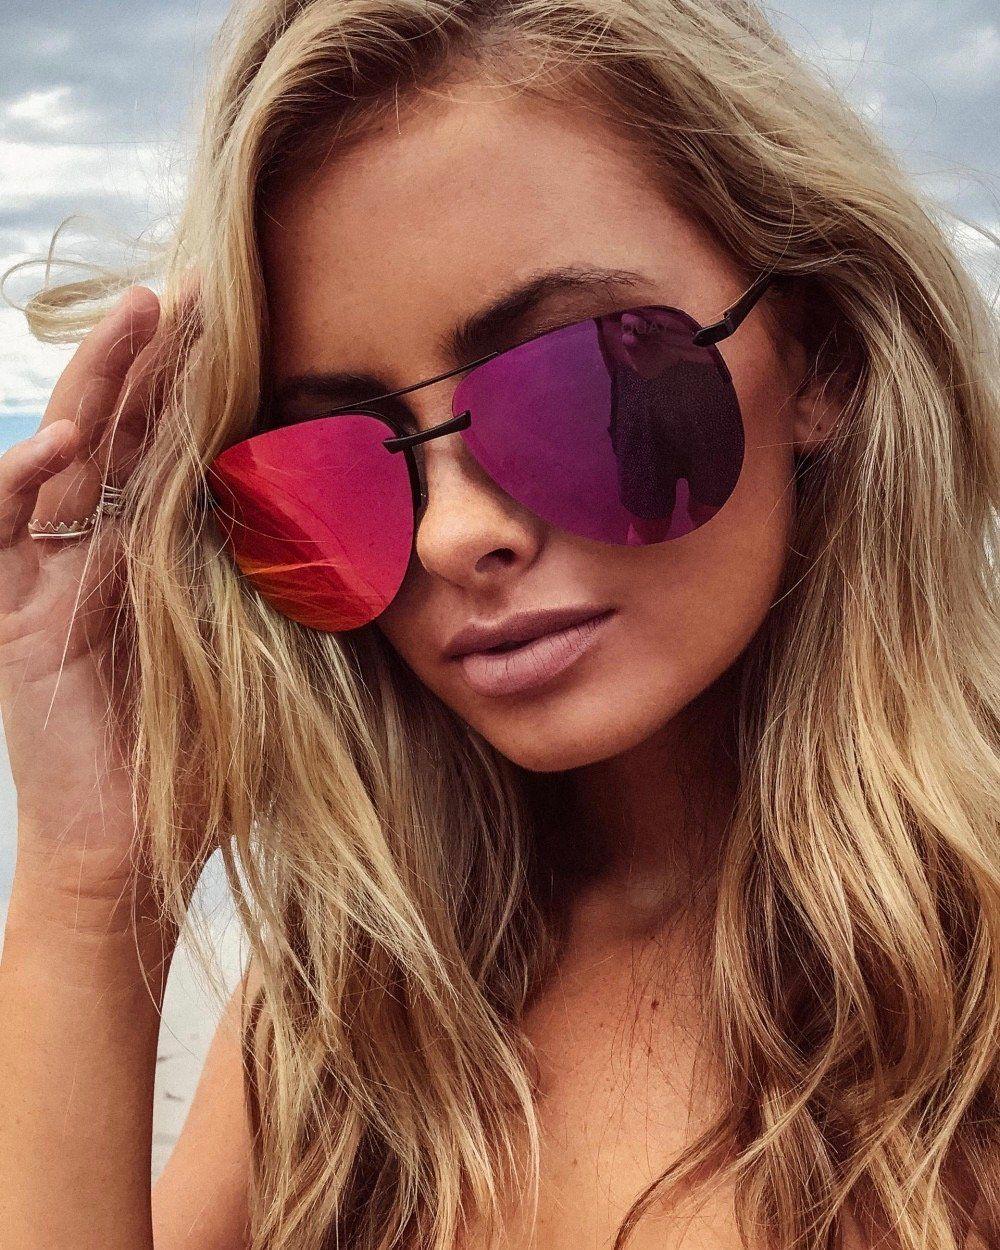 3cbb8ccbe8 Quay australia - the playa 64mm aviator sunglasses - black pink ...